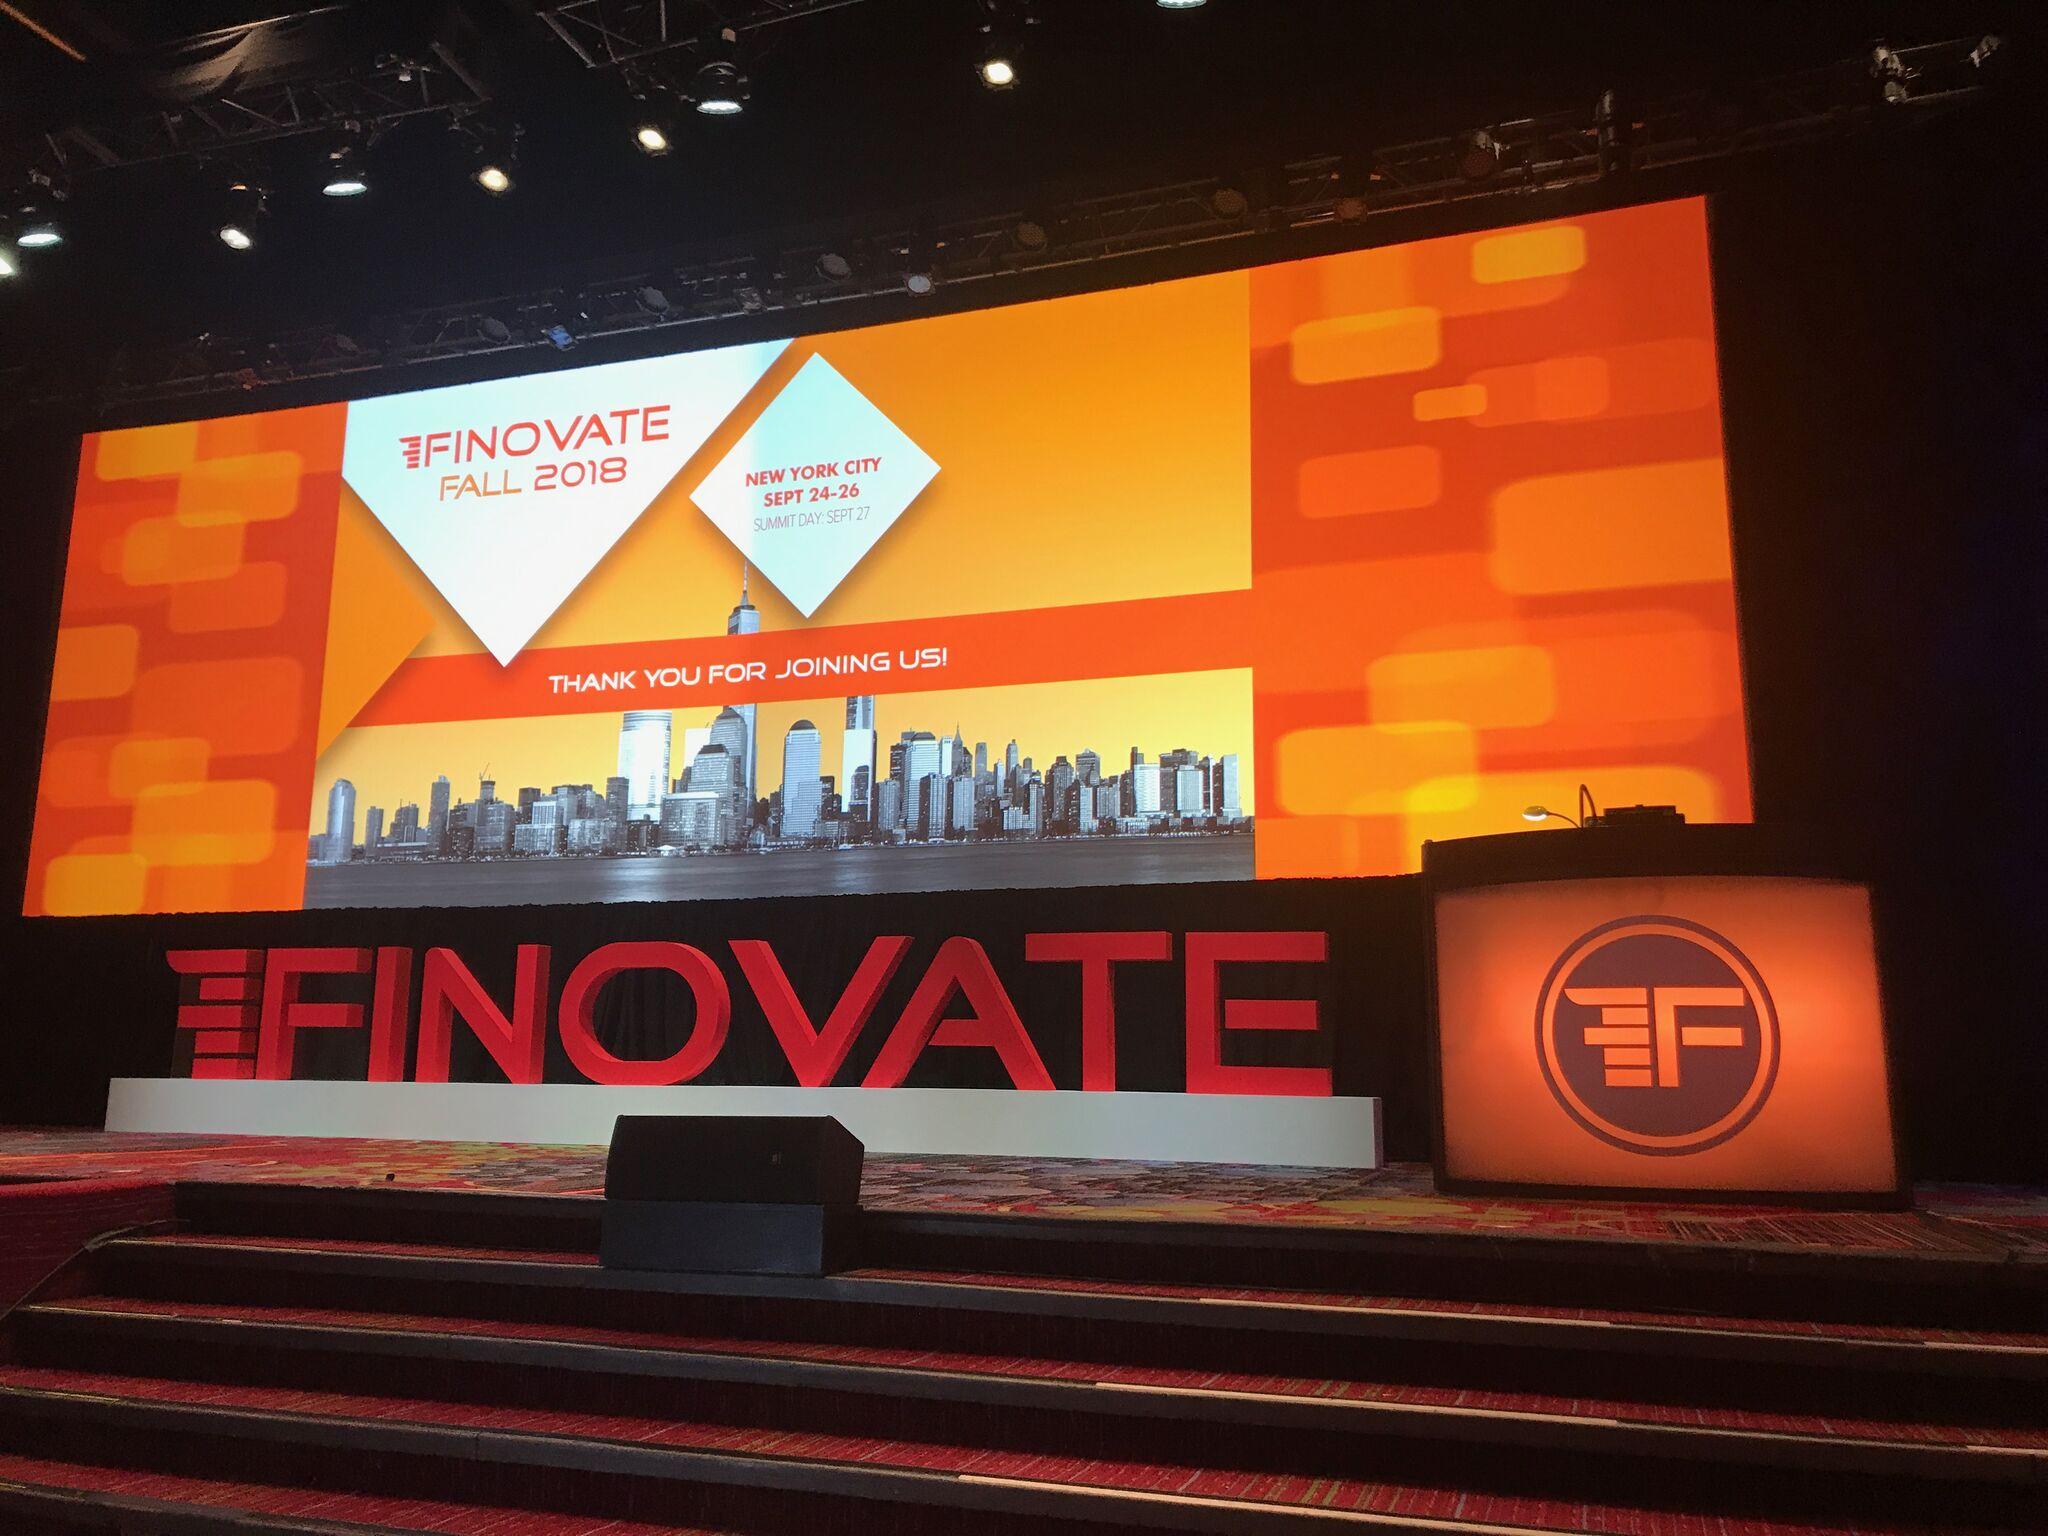 FinovateFall 2018 Live Blog - Day 2